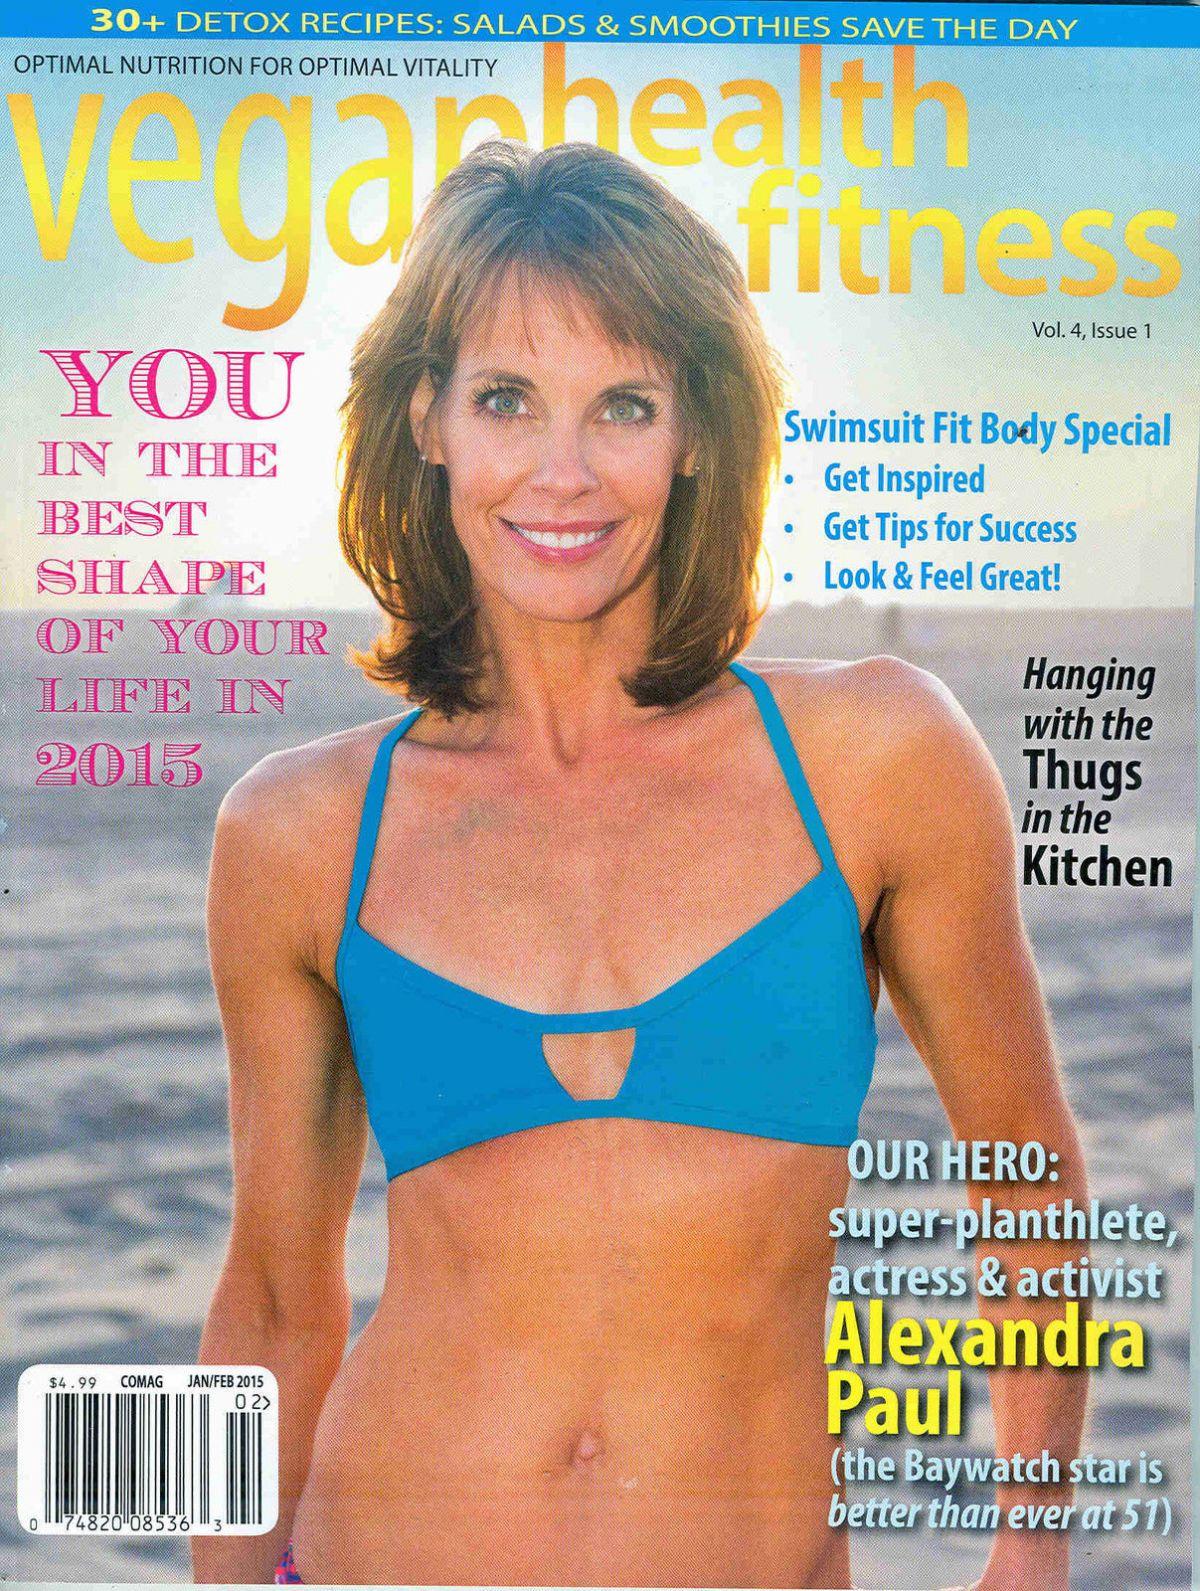 ALEXANDRA PAUL on the Cover of Vegan Health & Fitness Magazine, February 2015 Issue